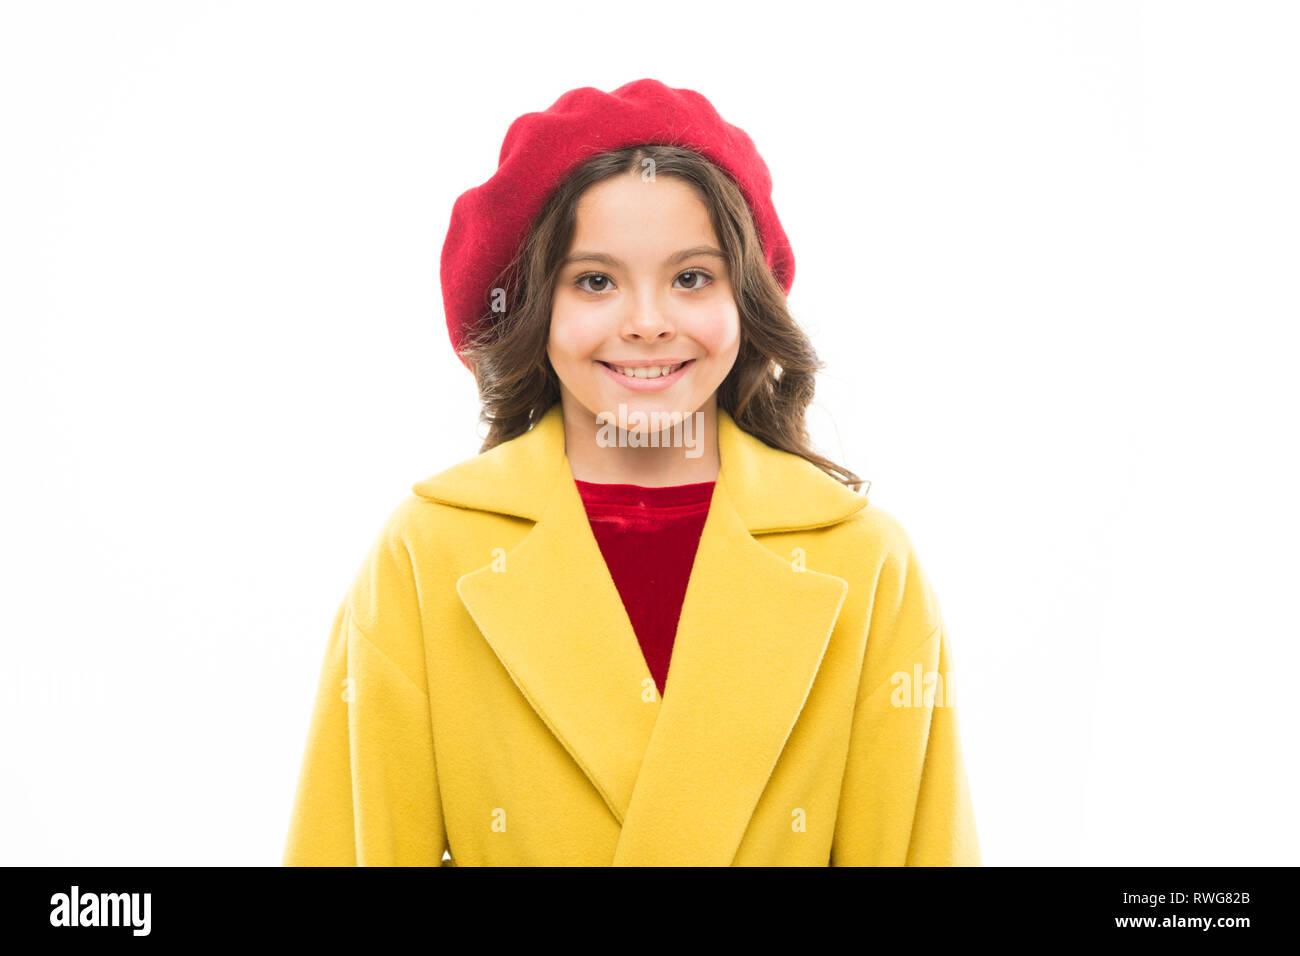 26fb6db119 Fancy girl. Vestirse como chica de moda. Kid cute little girl cara  sonriente posando